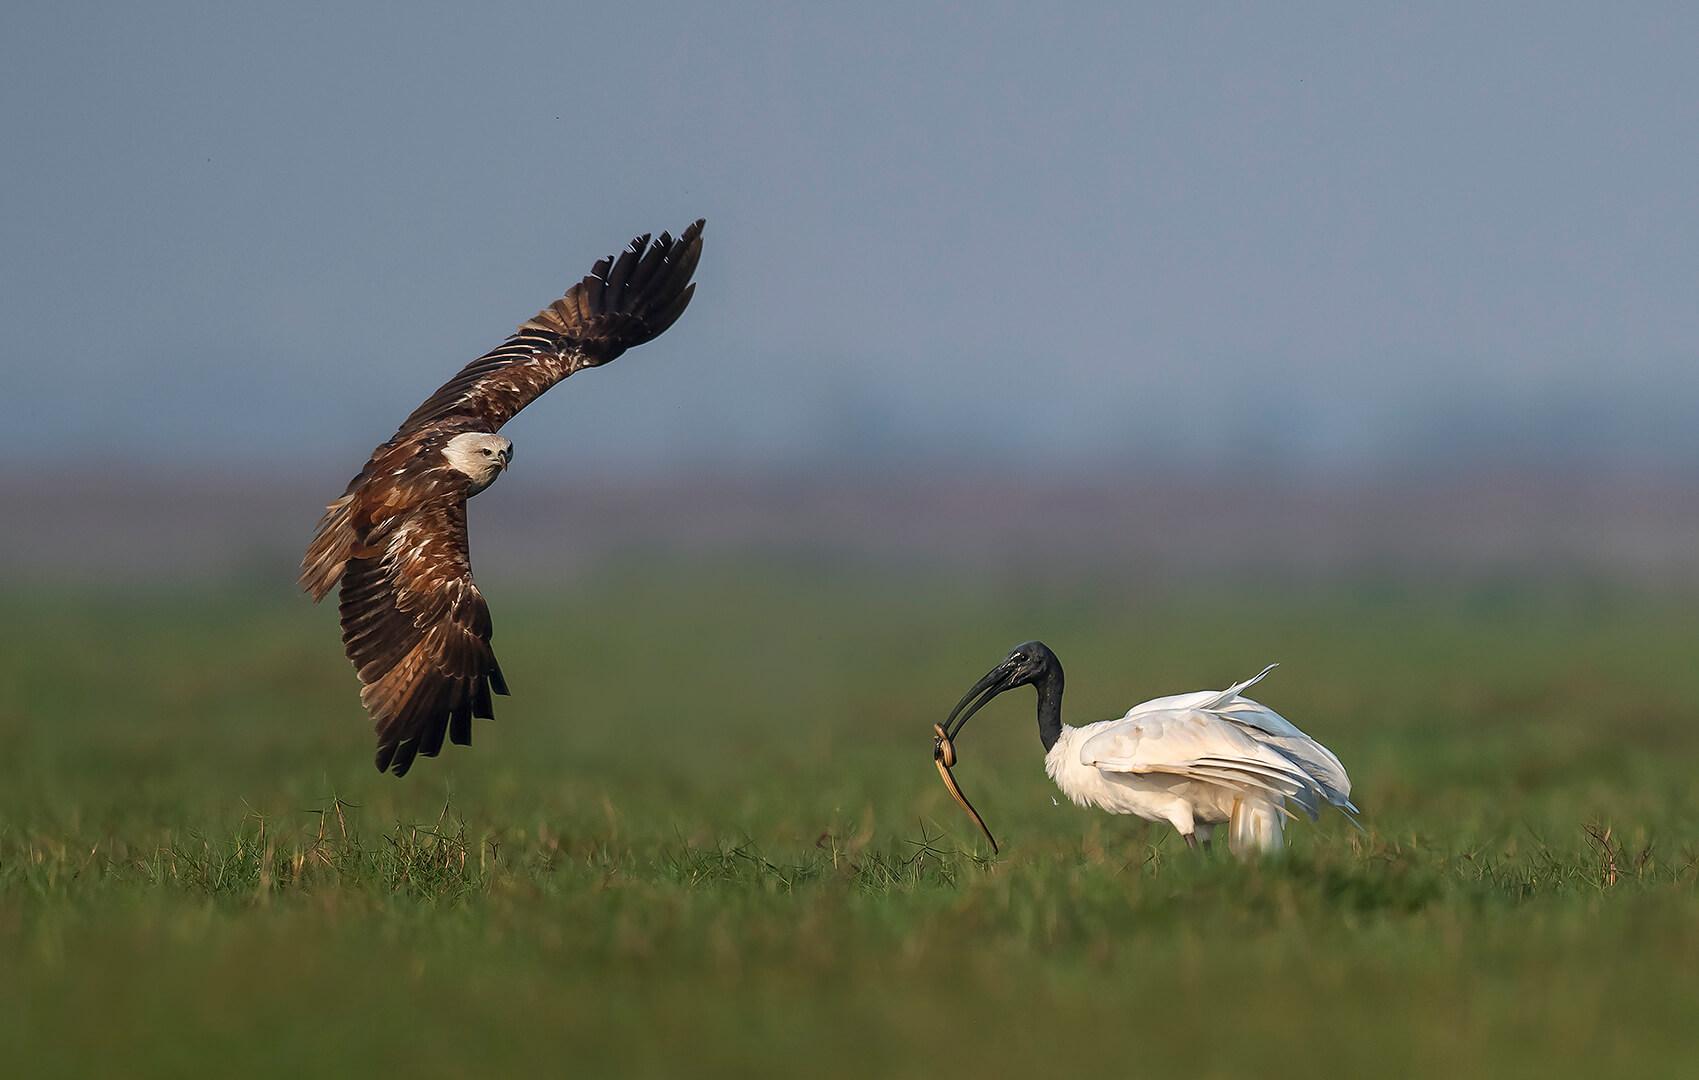 Pramod Govind Shanbhag Brahminy Kite attacking Ibis 1